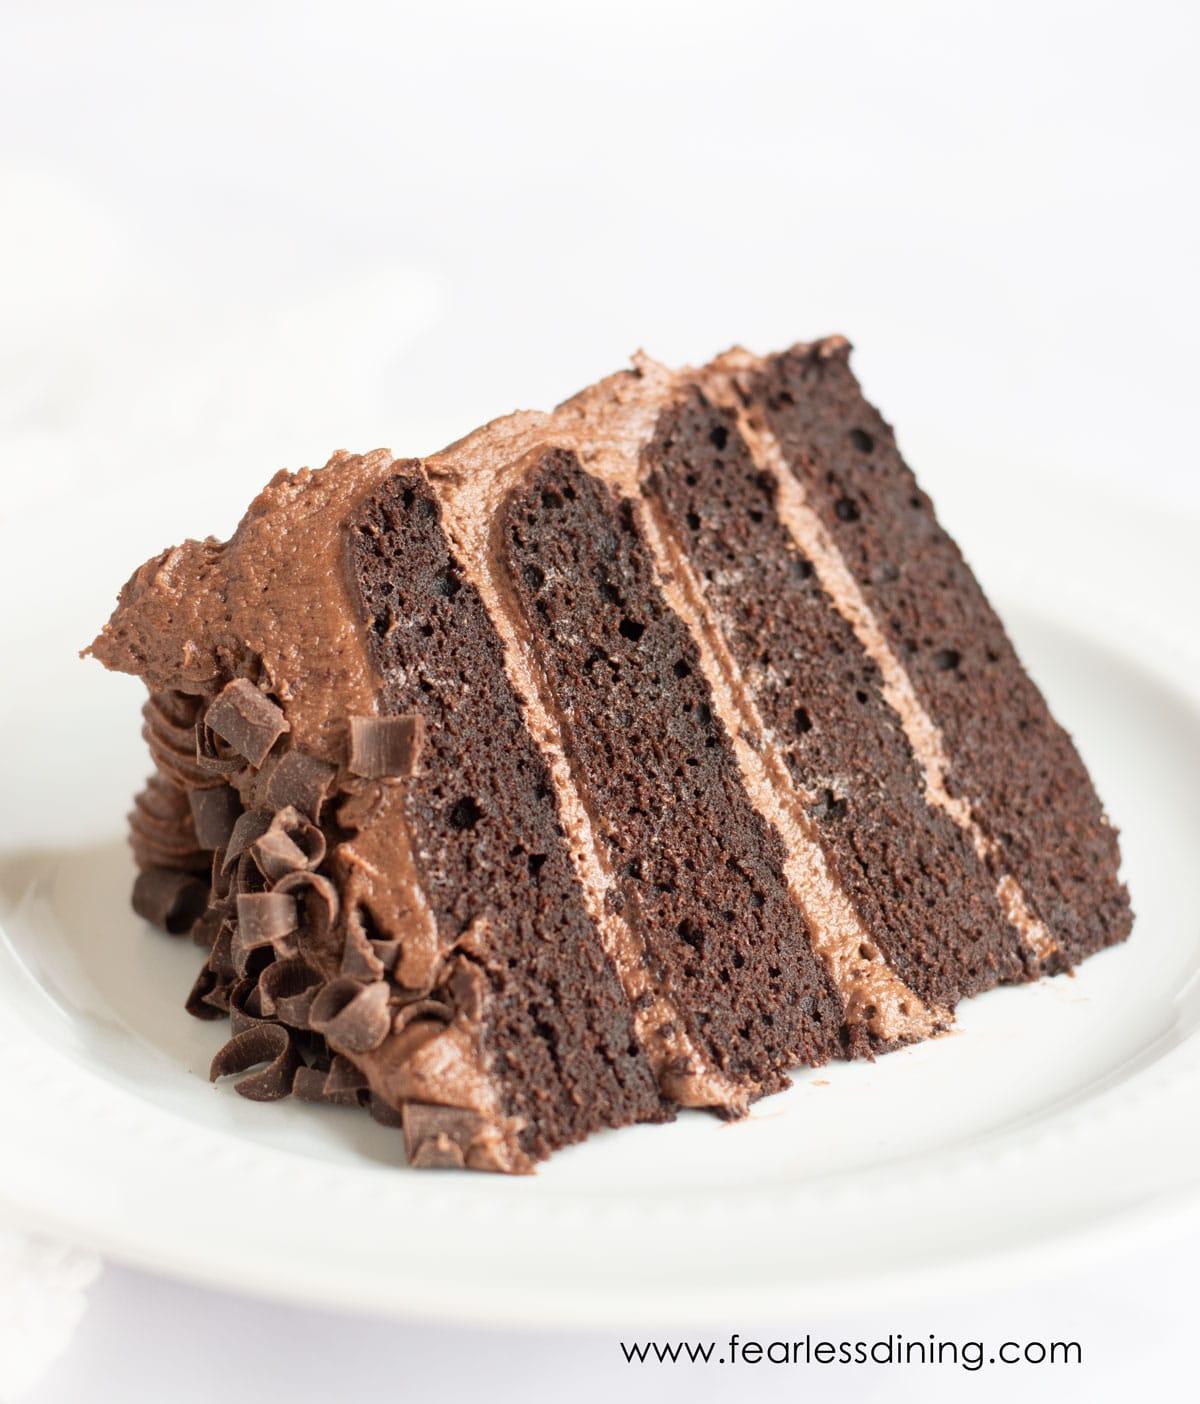 gluten free chocolate cake slice on a white plate